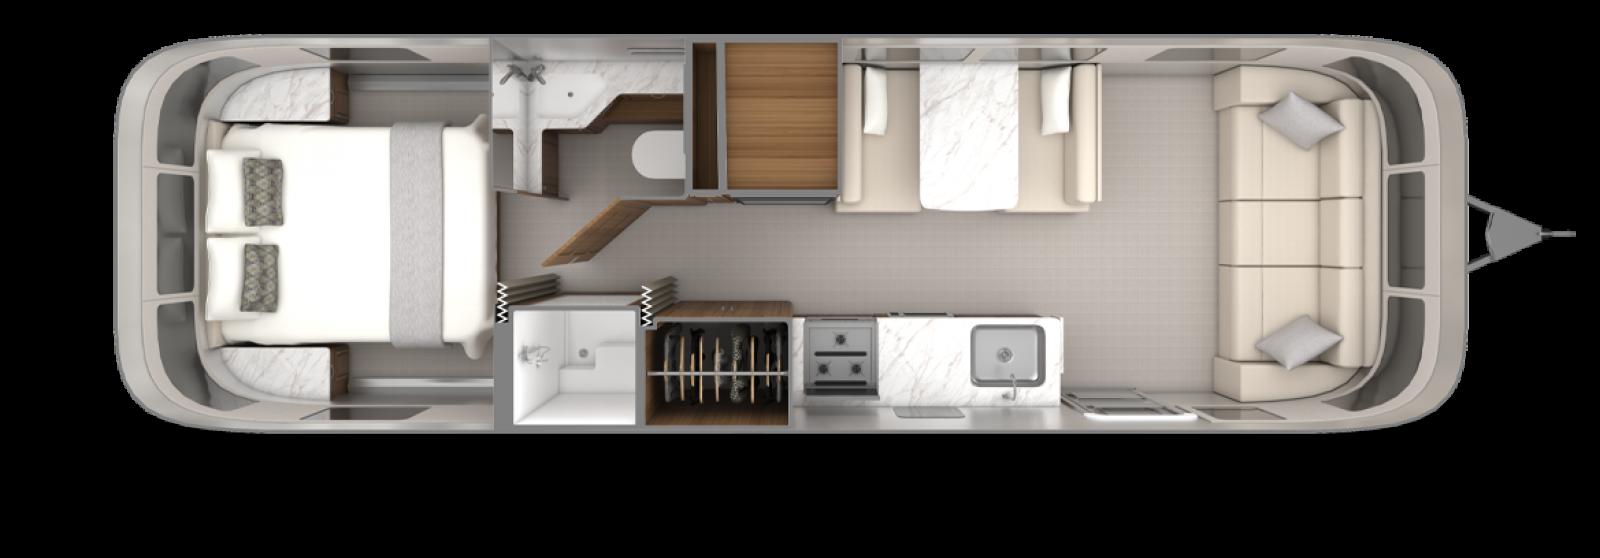 2022_Classic30RB_Floorplan_EstateBrown_Chamomile